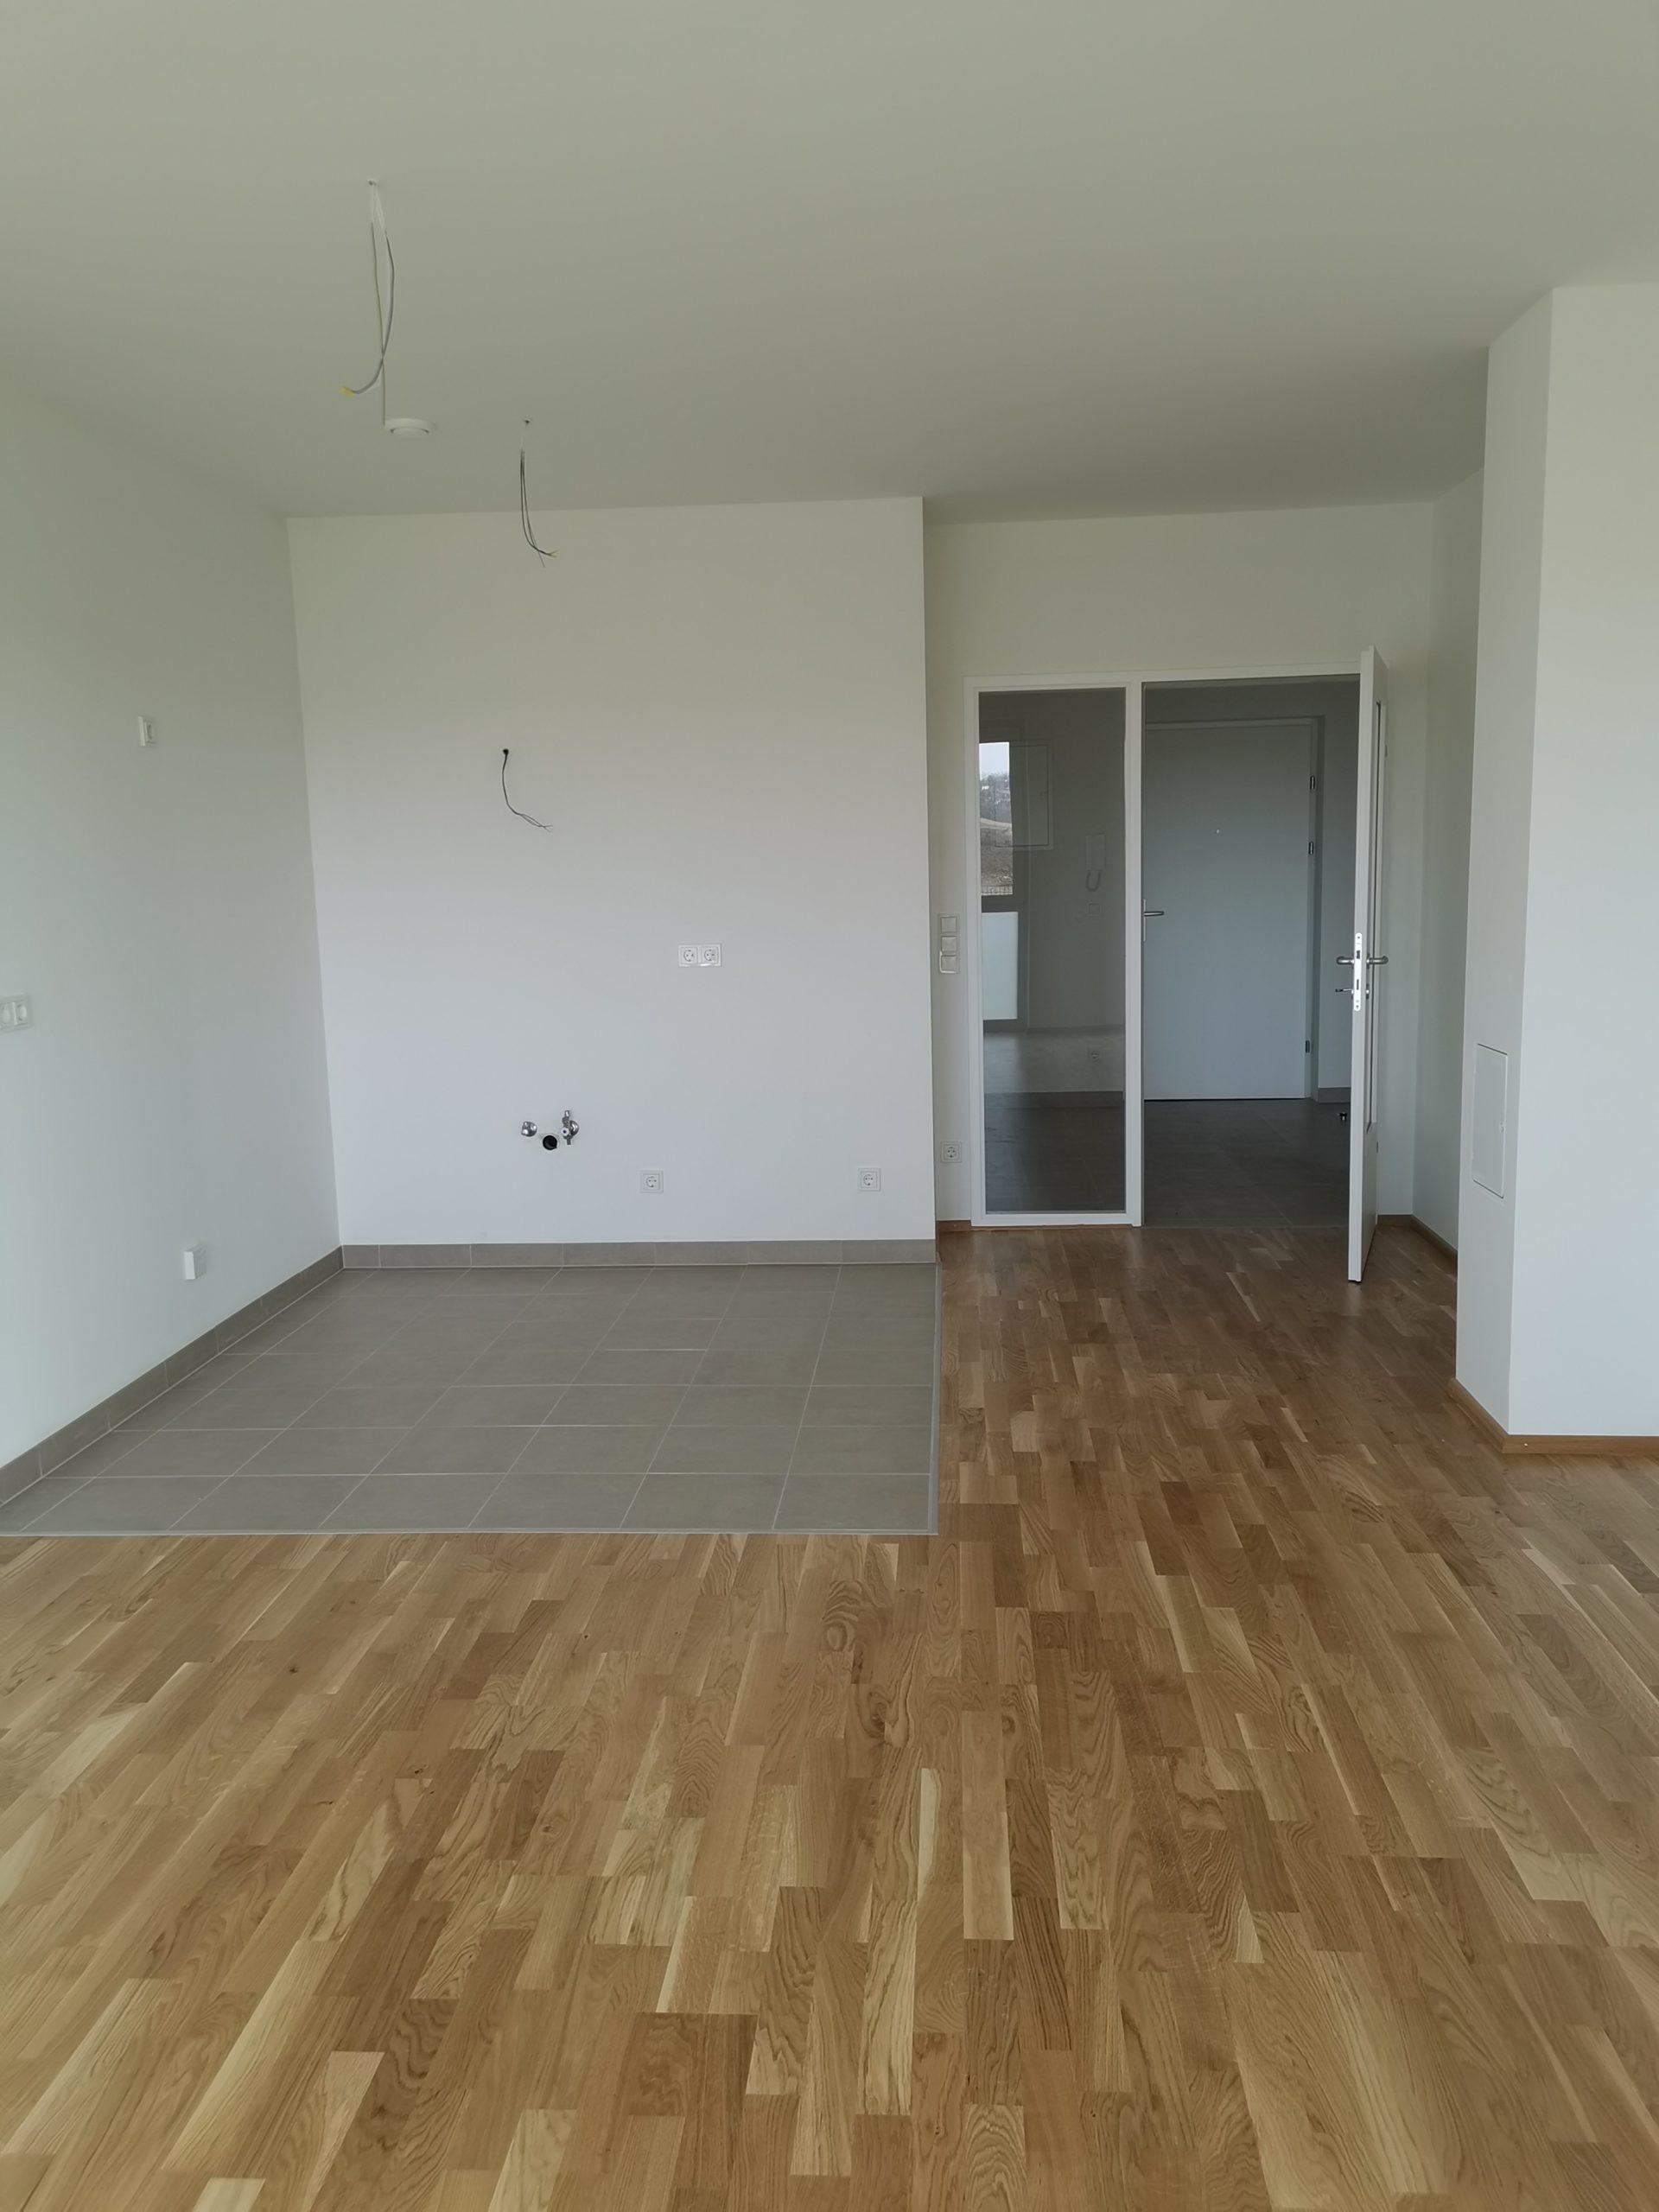 Immobilie von Kamptal in 3730 Eggenburg, Horn, Eggenburg VII - Top 203 #1